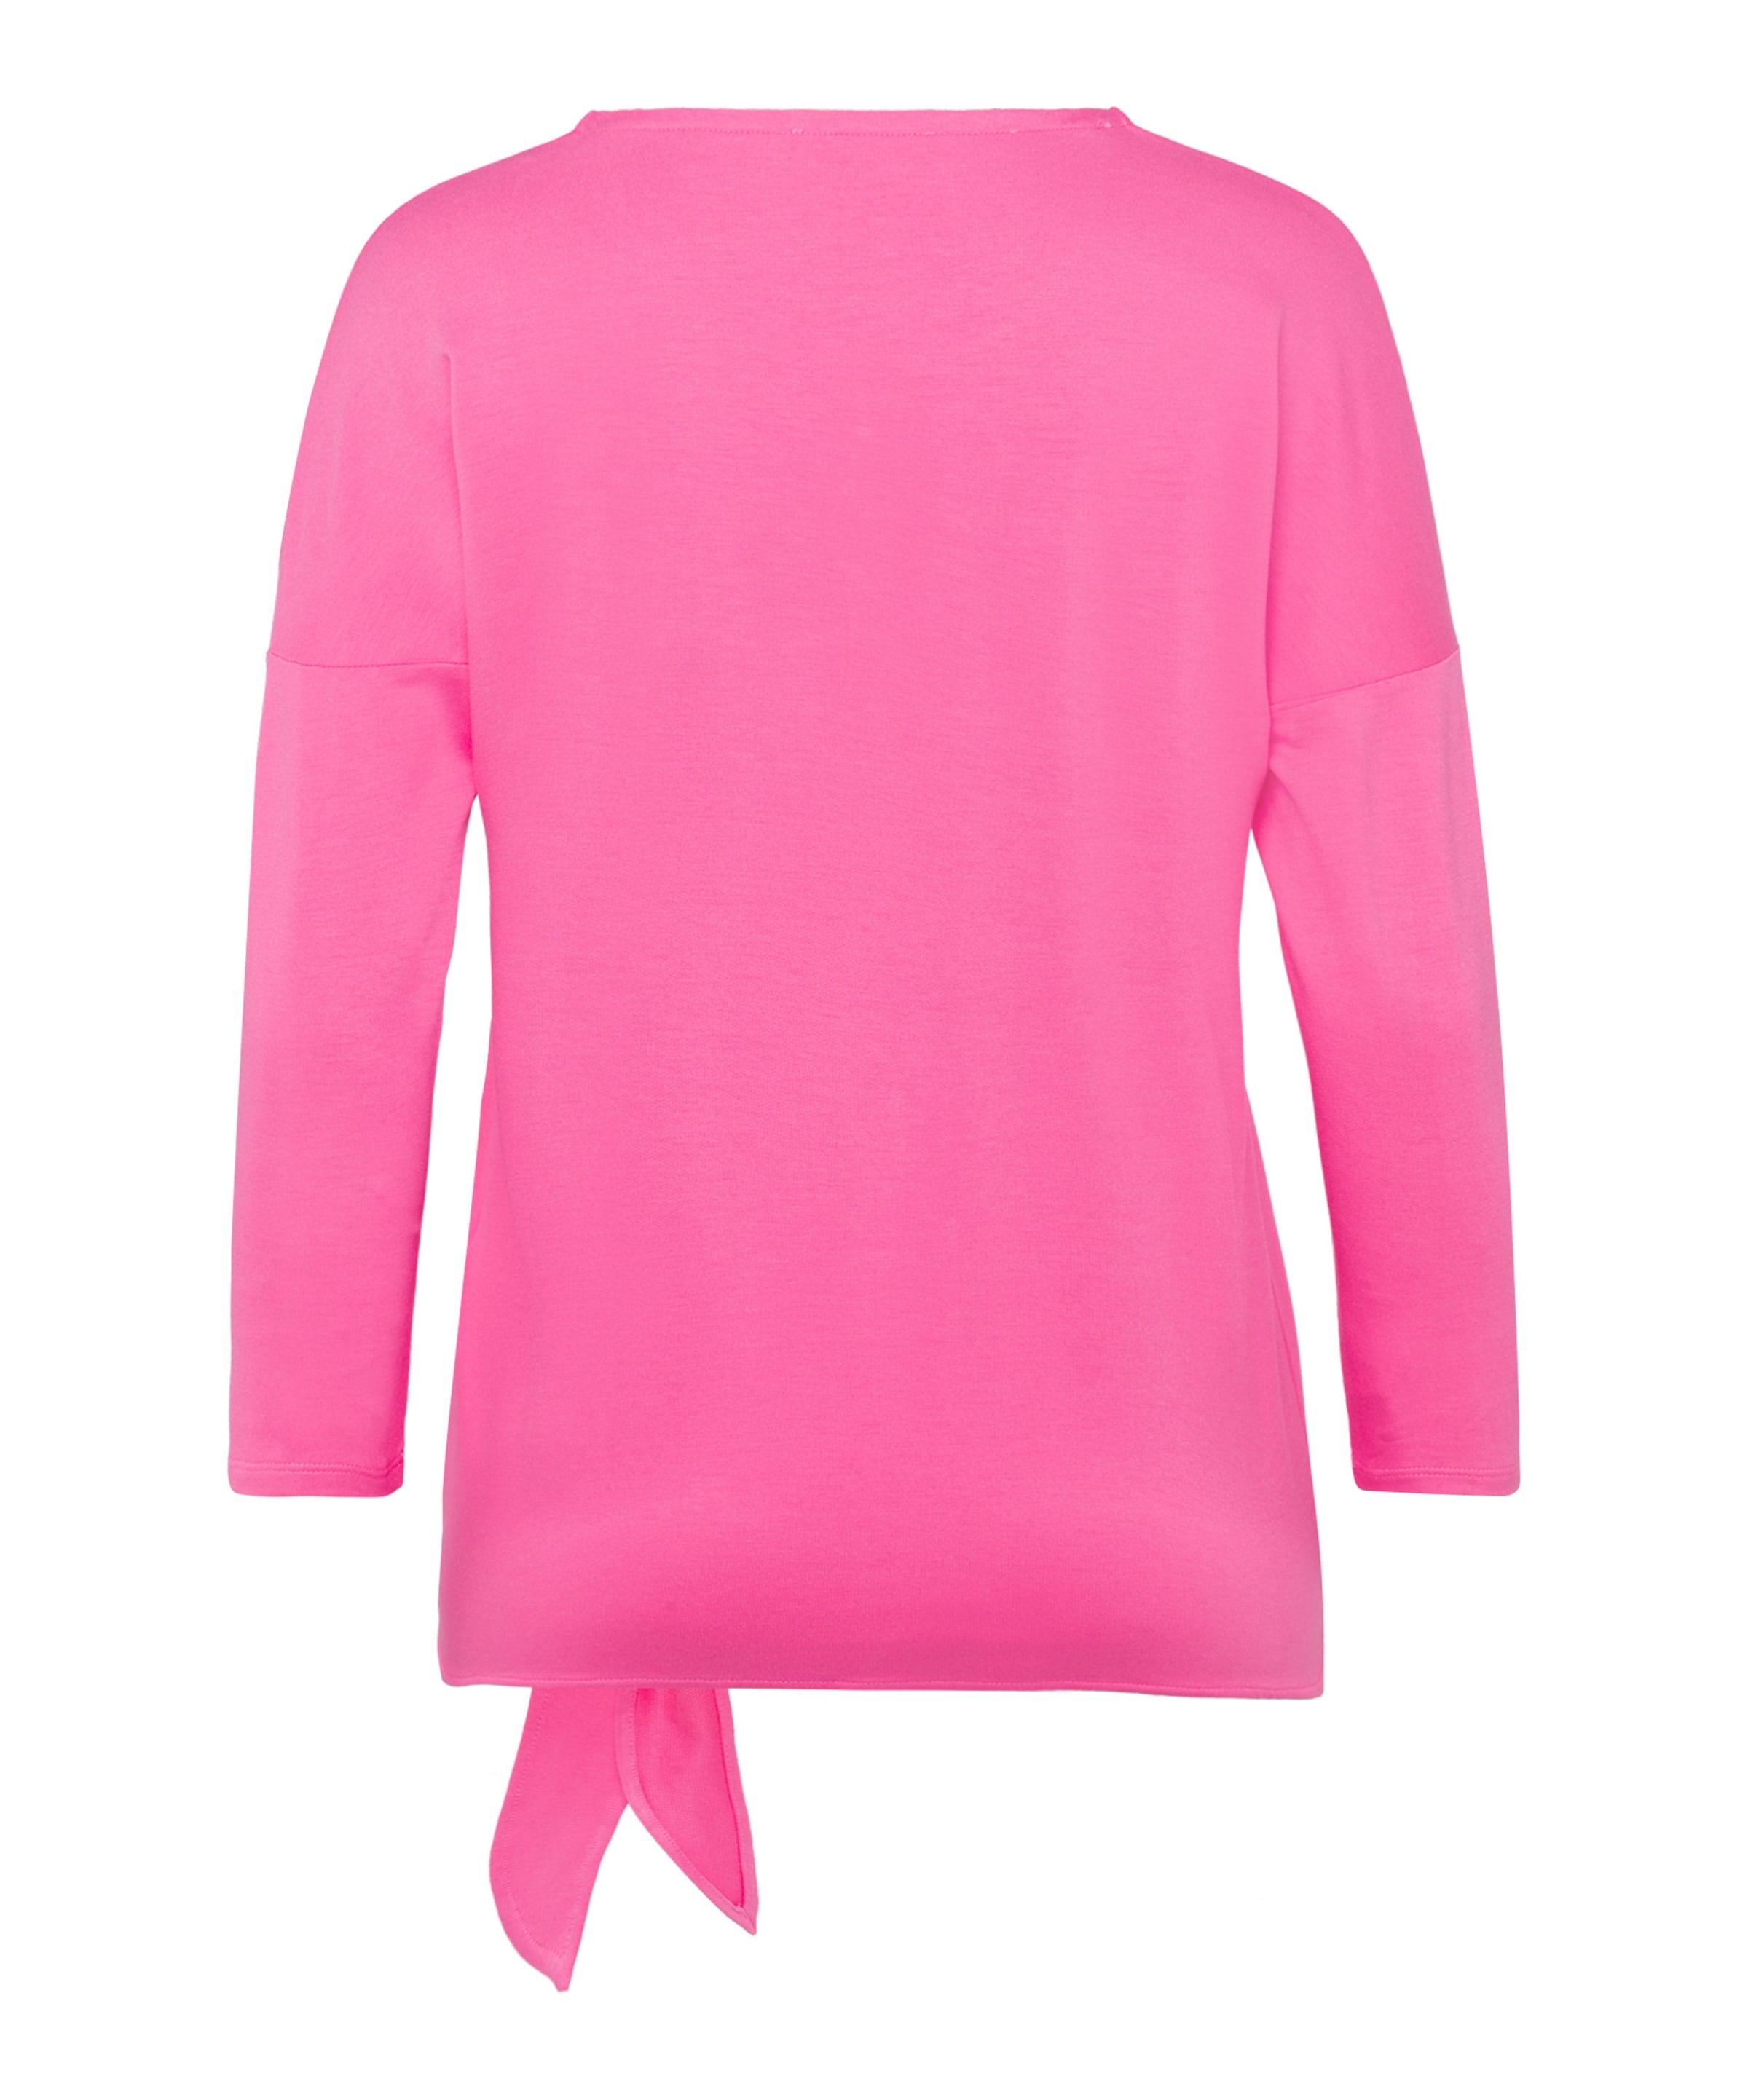 Pink Brax Shirt ' In Carlotta' rdhQxtsC